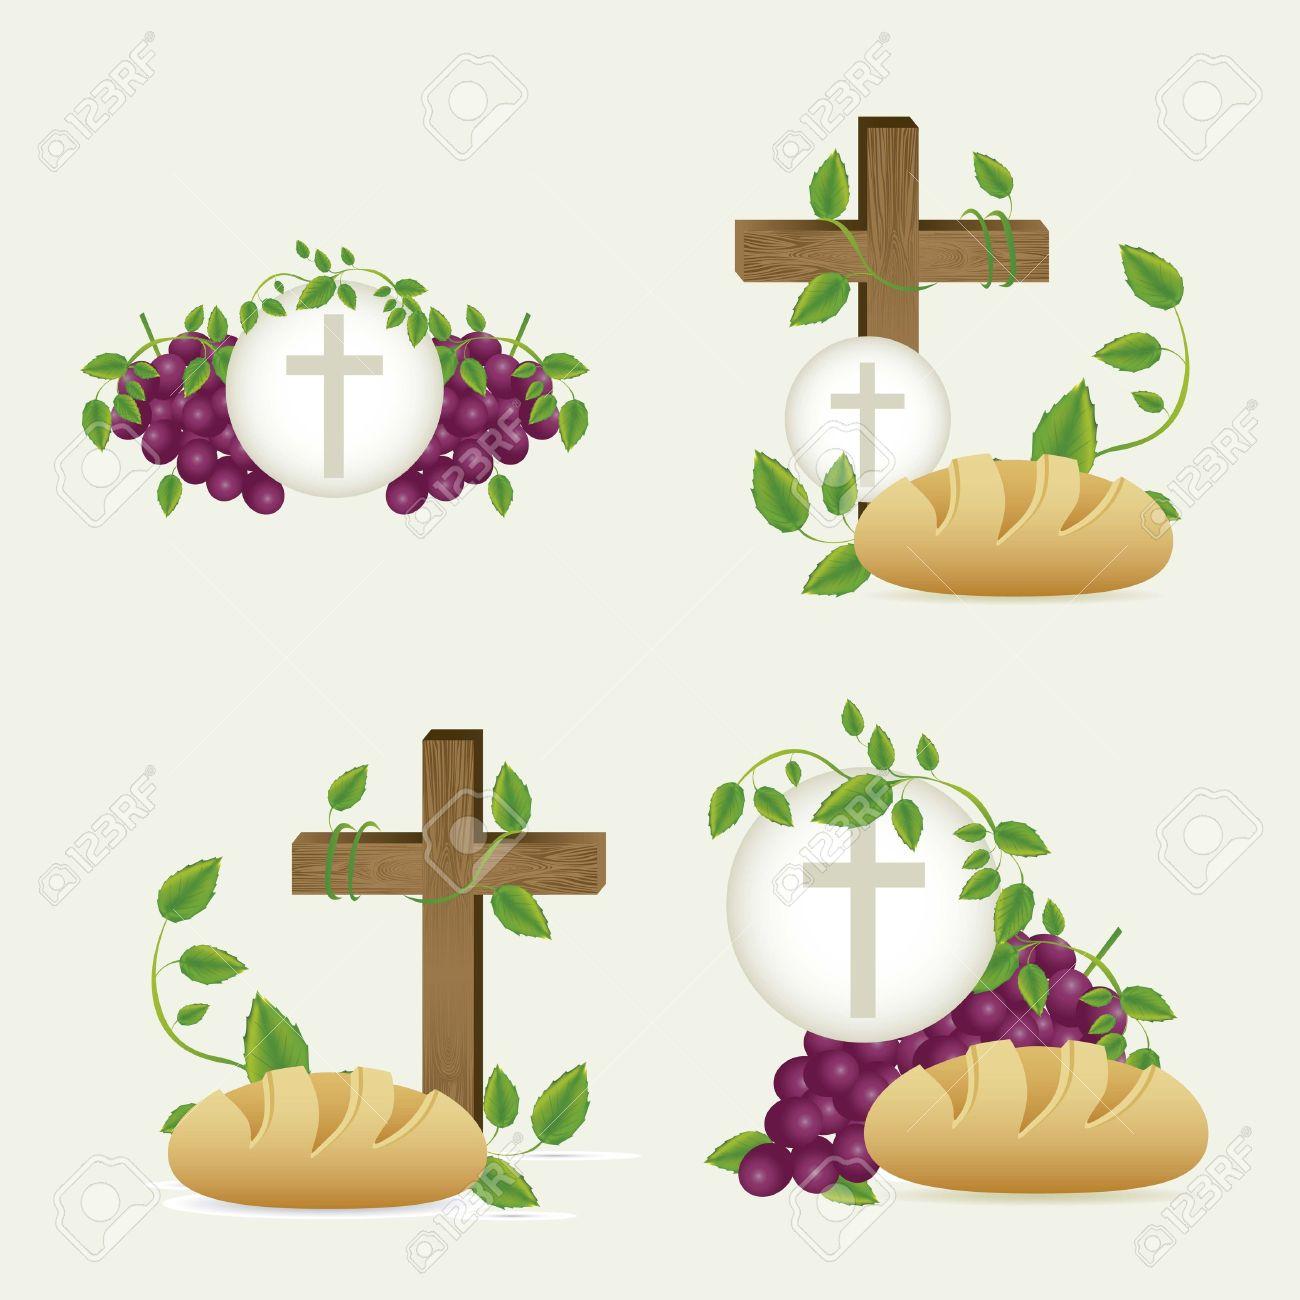 Illustration Of Jesus Christ, Eucharist And The Sacrament Of ...